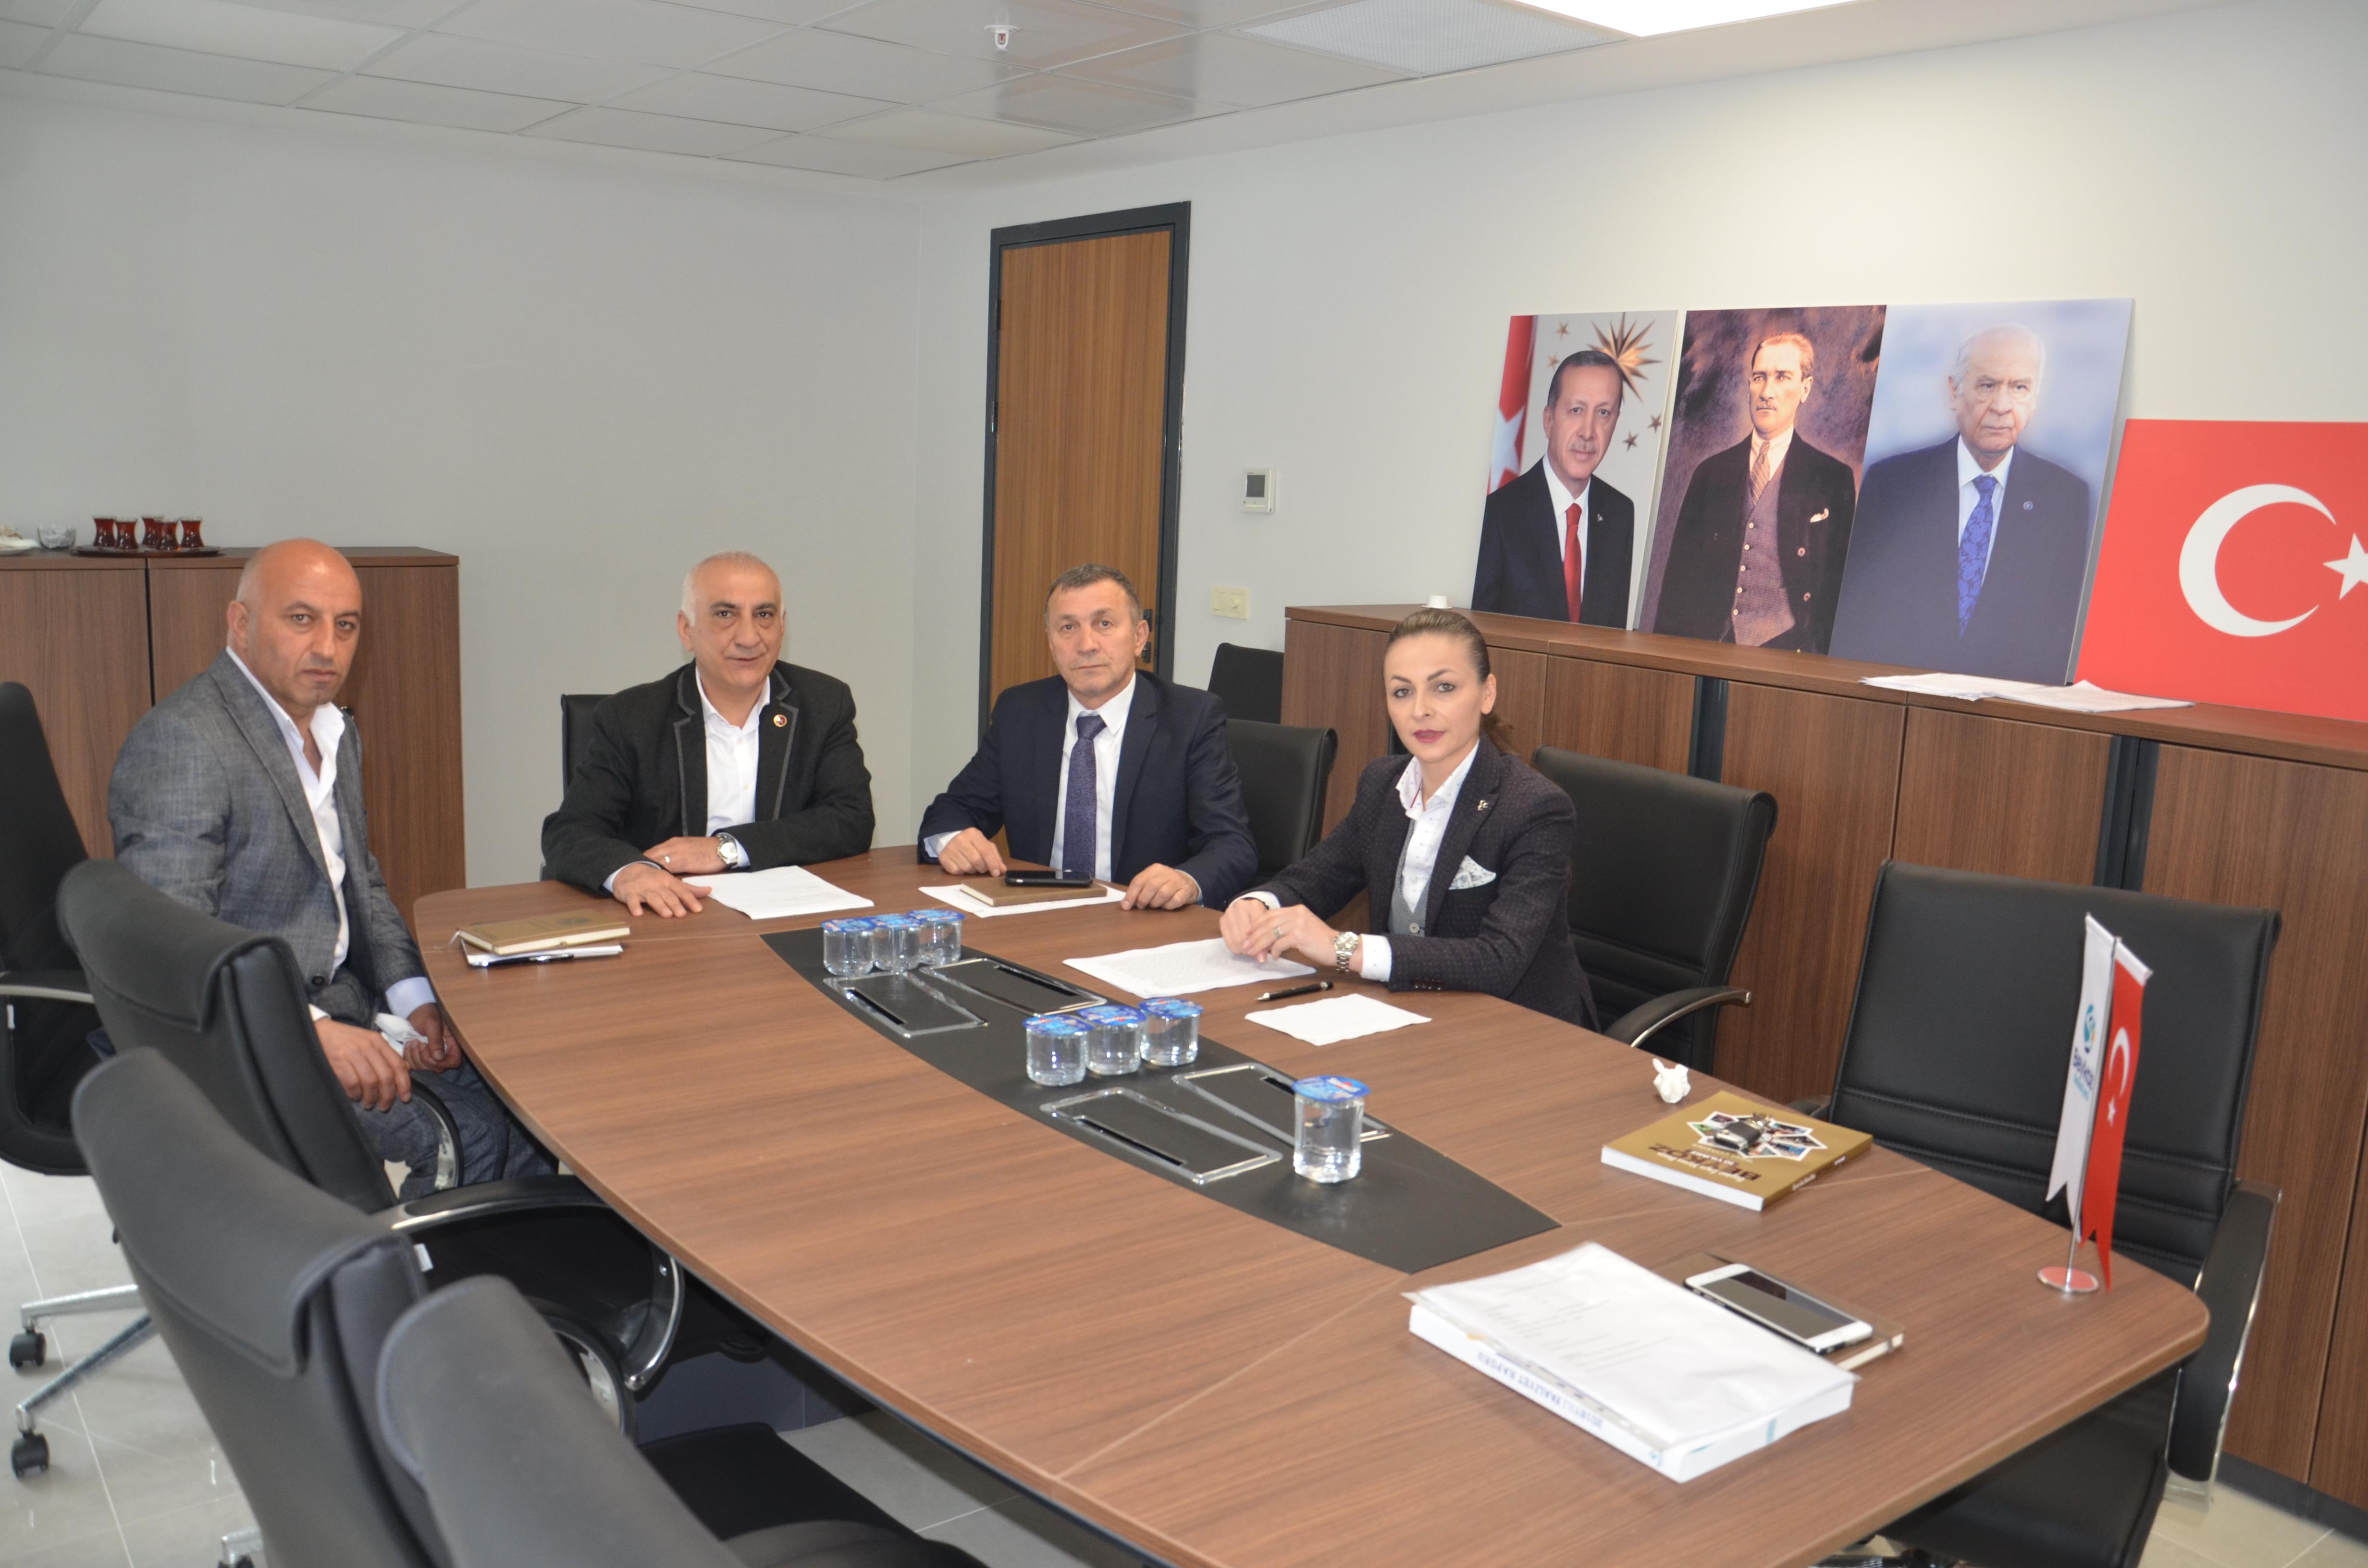 Beykoz Belediye Meclisi  3 partili oldu